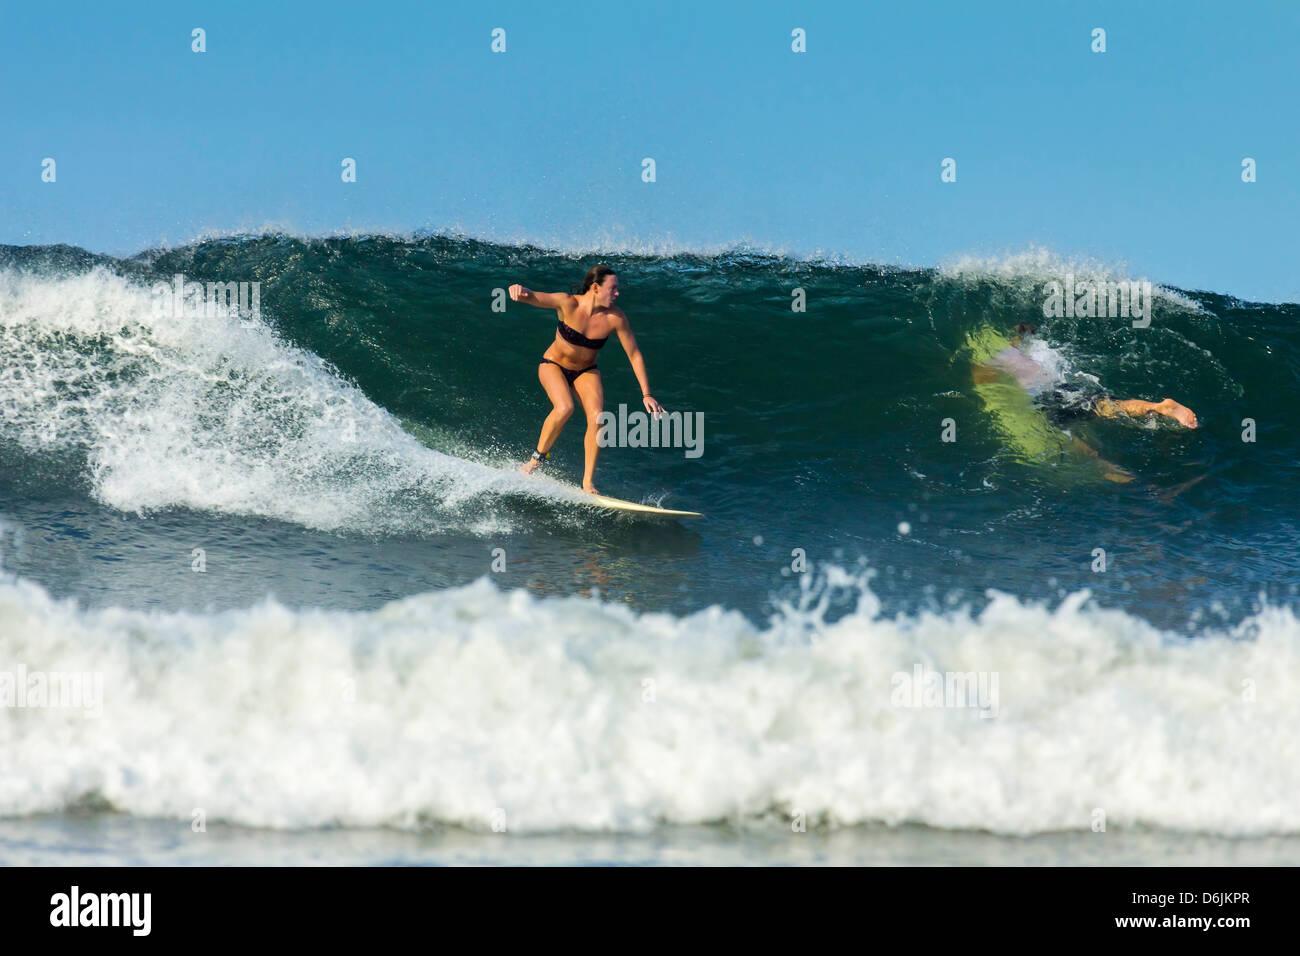 Girl surfer riding wave at popular Playa Guiones surf beach, Nosara, Nicoya Peninsula, Guanacaste Province, Costa - Stock Image